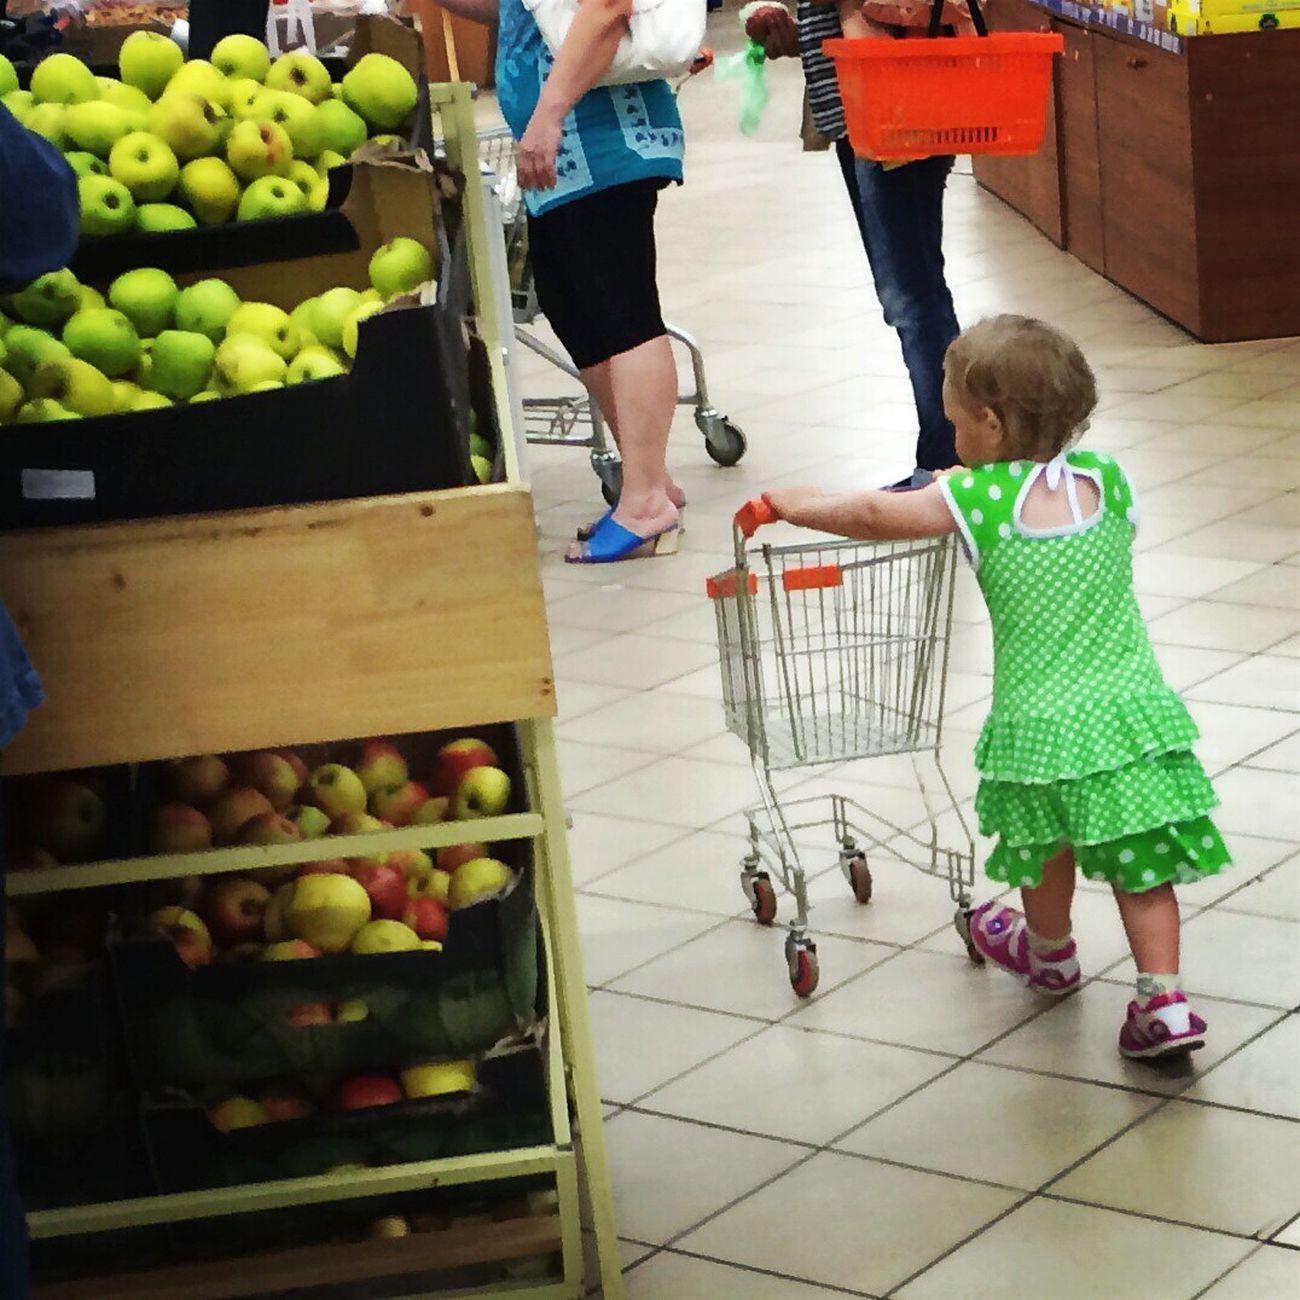 Littlegirl Cute Girl Colors Gerl Enjoying Life Likeit :) Childrenphoto Sweet Child